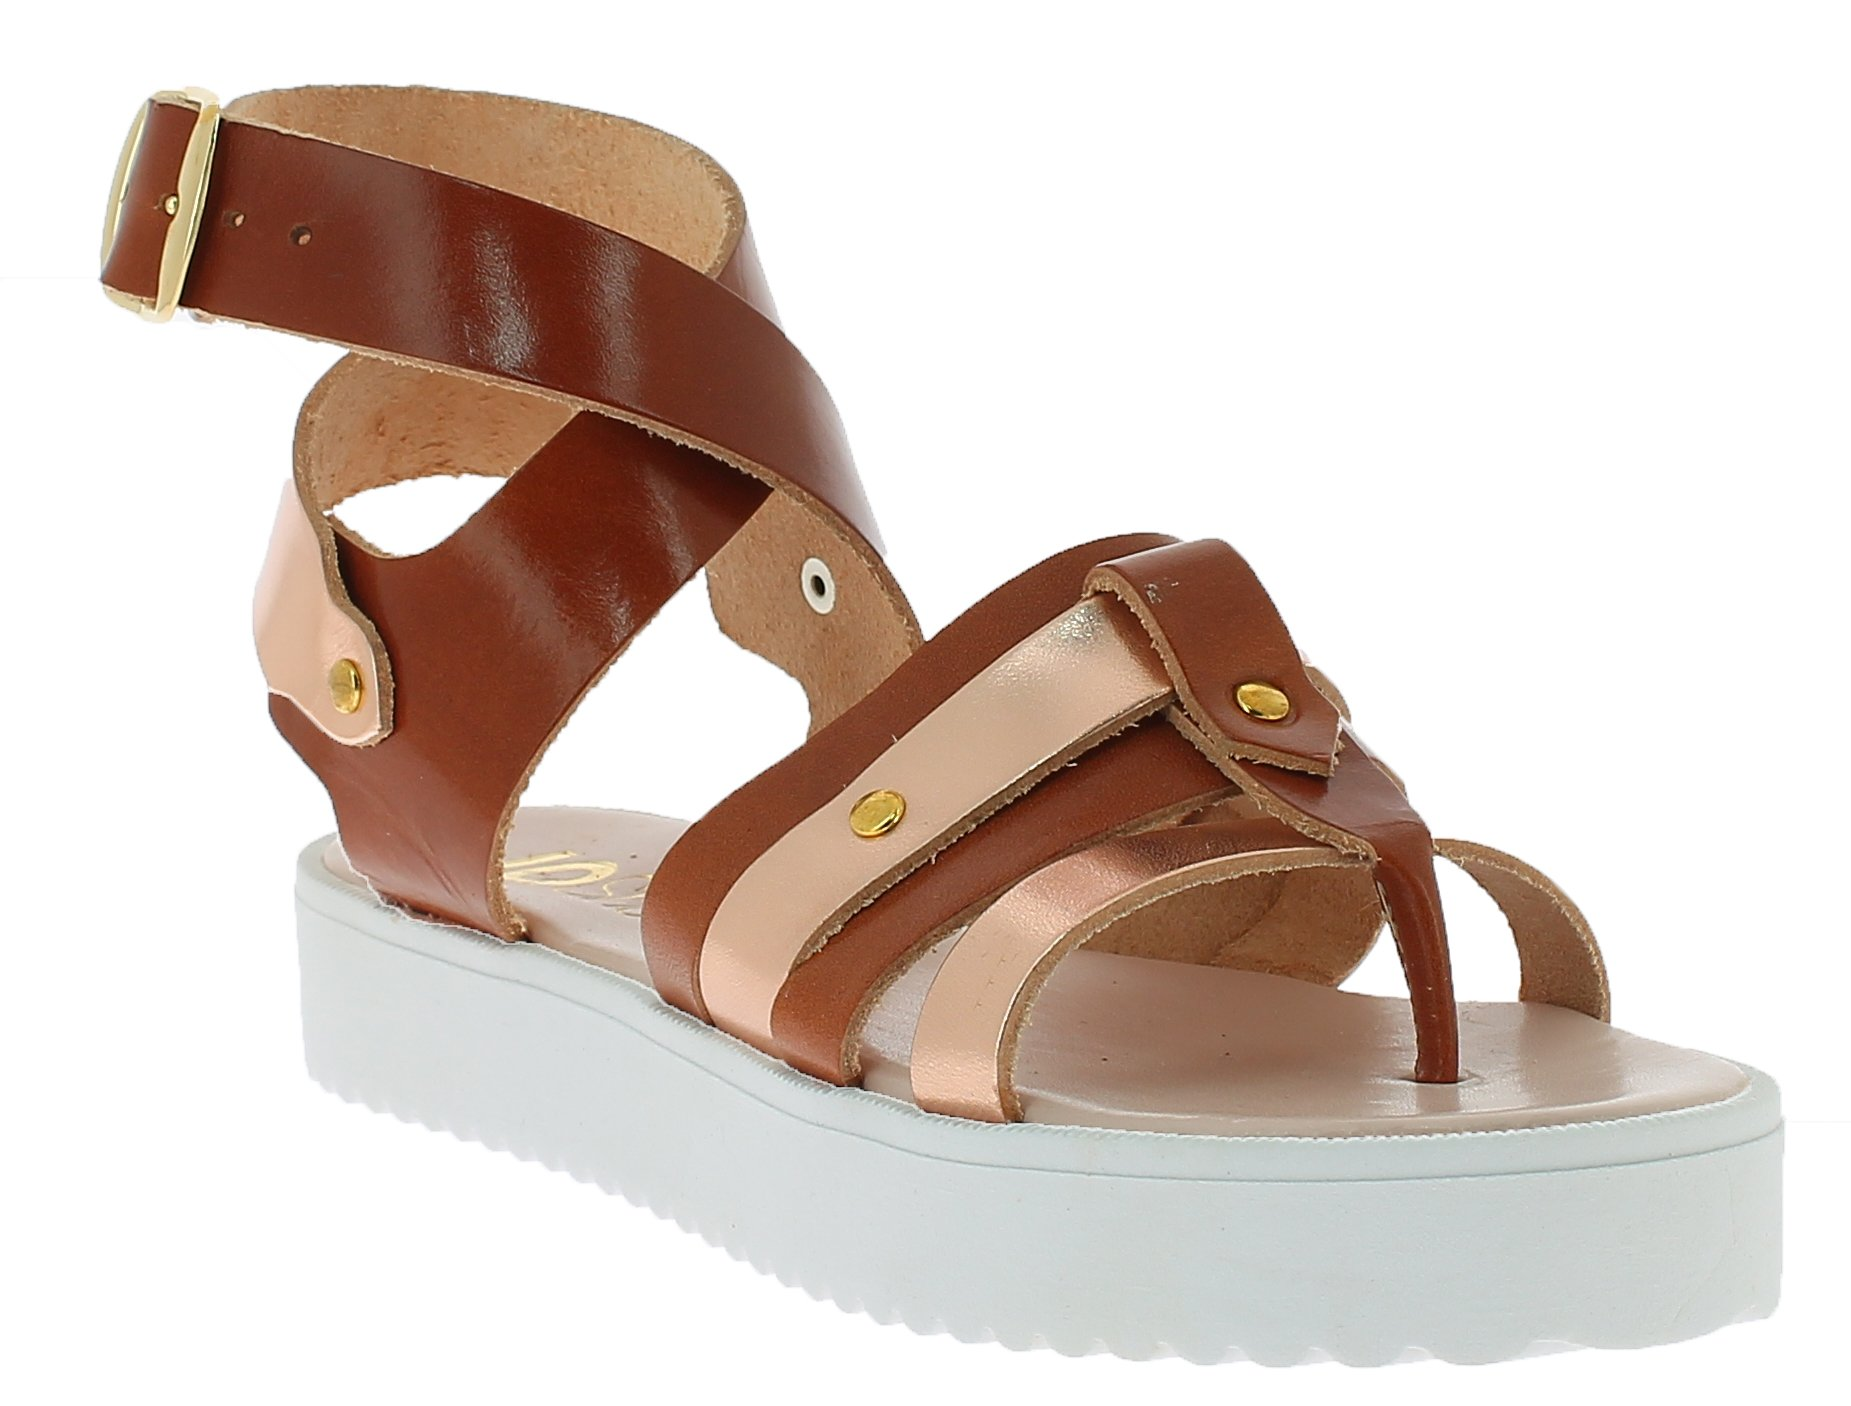 IQSHOES Γυναικείο Πέδιλο B45 Μπρονζέ - IqShoes - 50.B45T bronze-bronze-36/1/34/7 παπούτσια  προσφορεσ